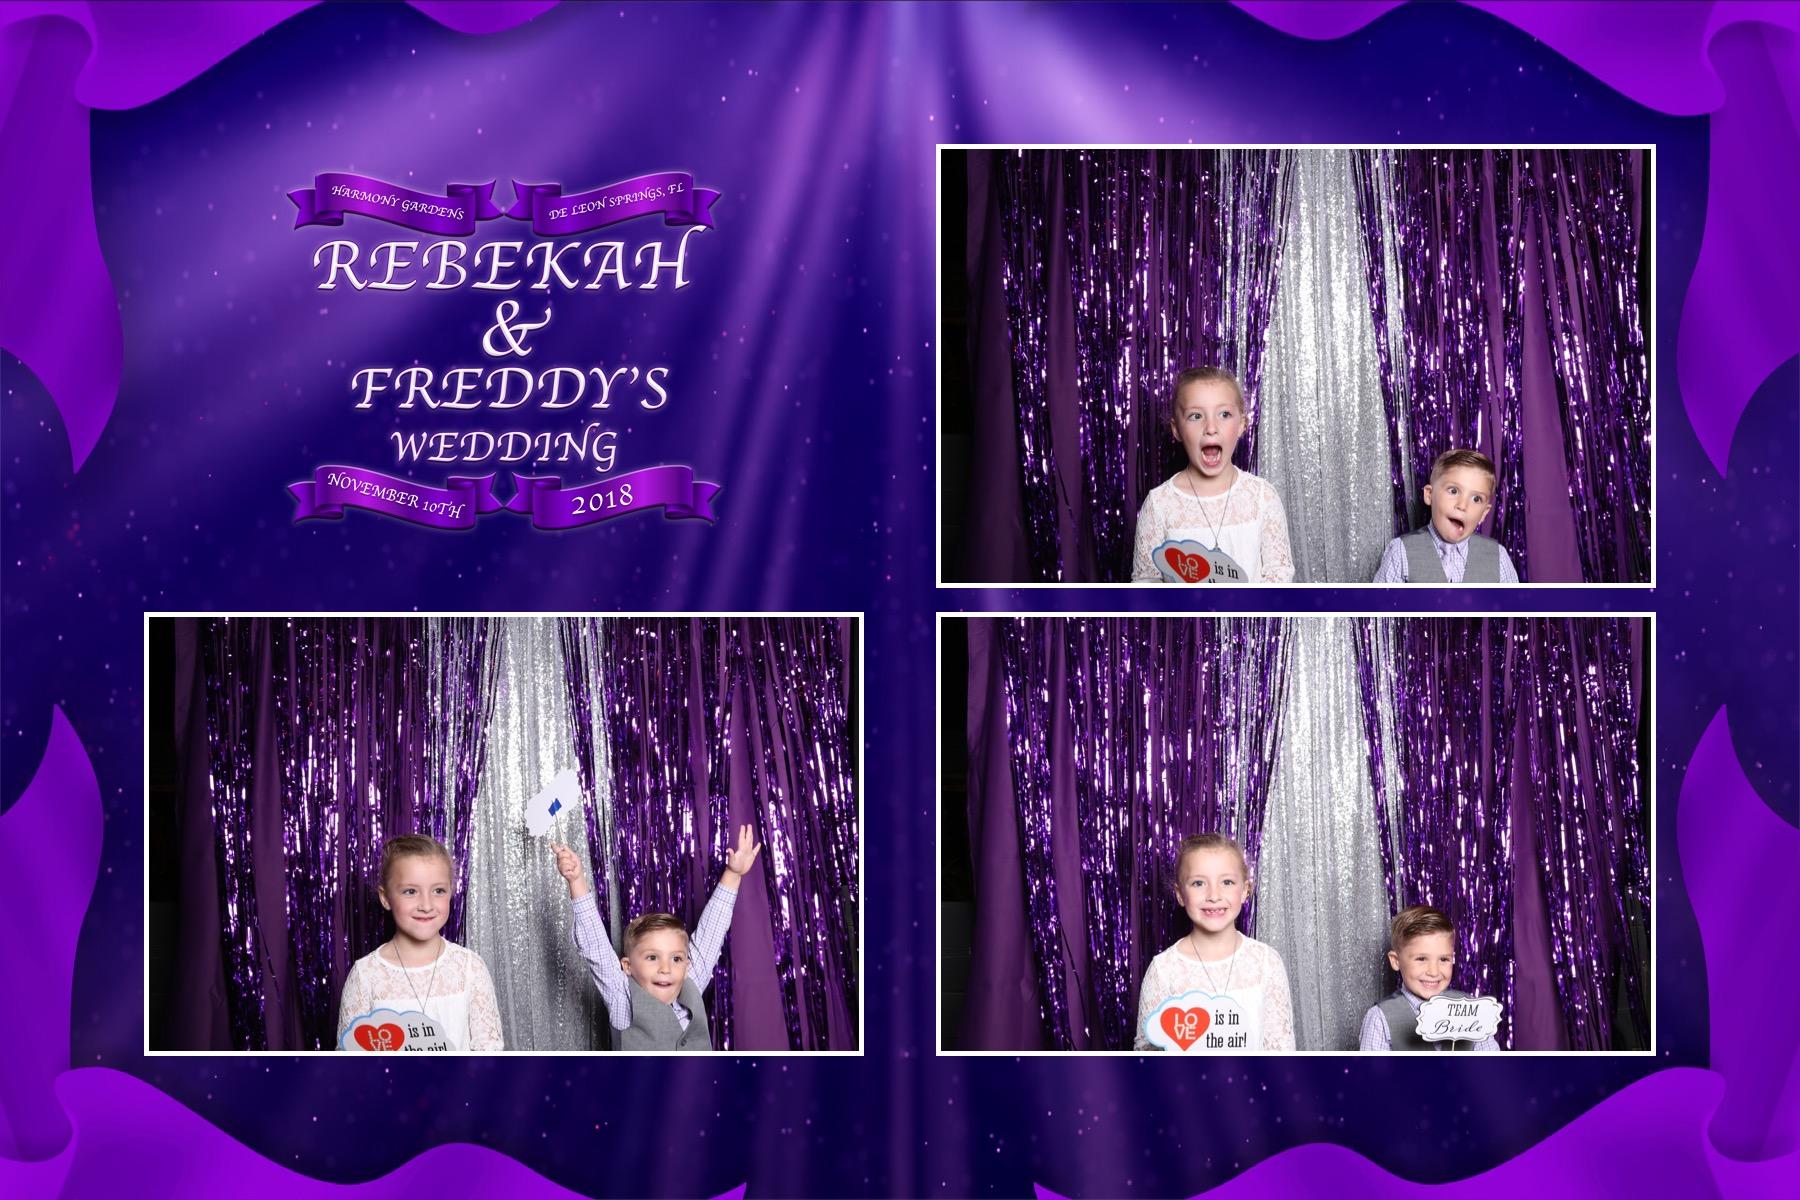 Booth Chamber Photo Booth Harmony Gardens wedding antoine Hart de leon springs_3 (2).jpeg